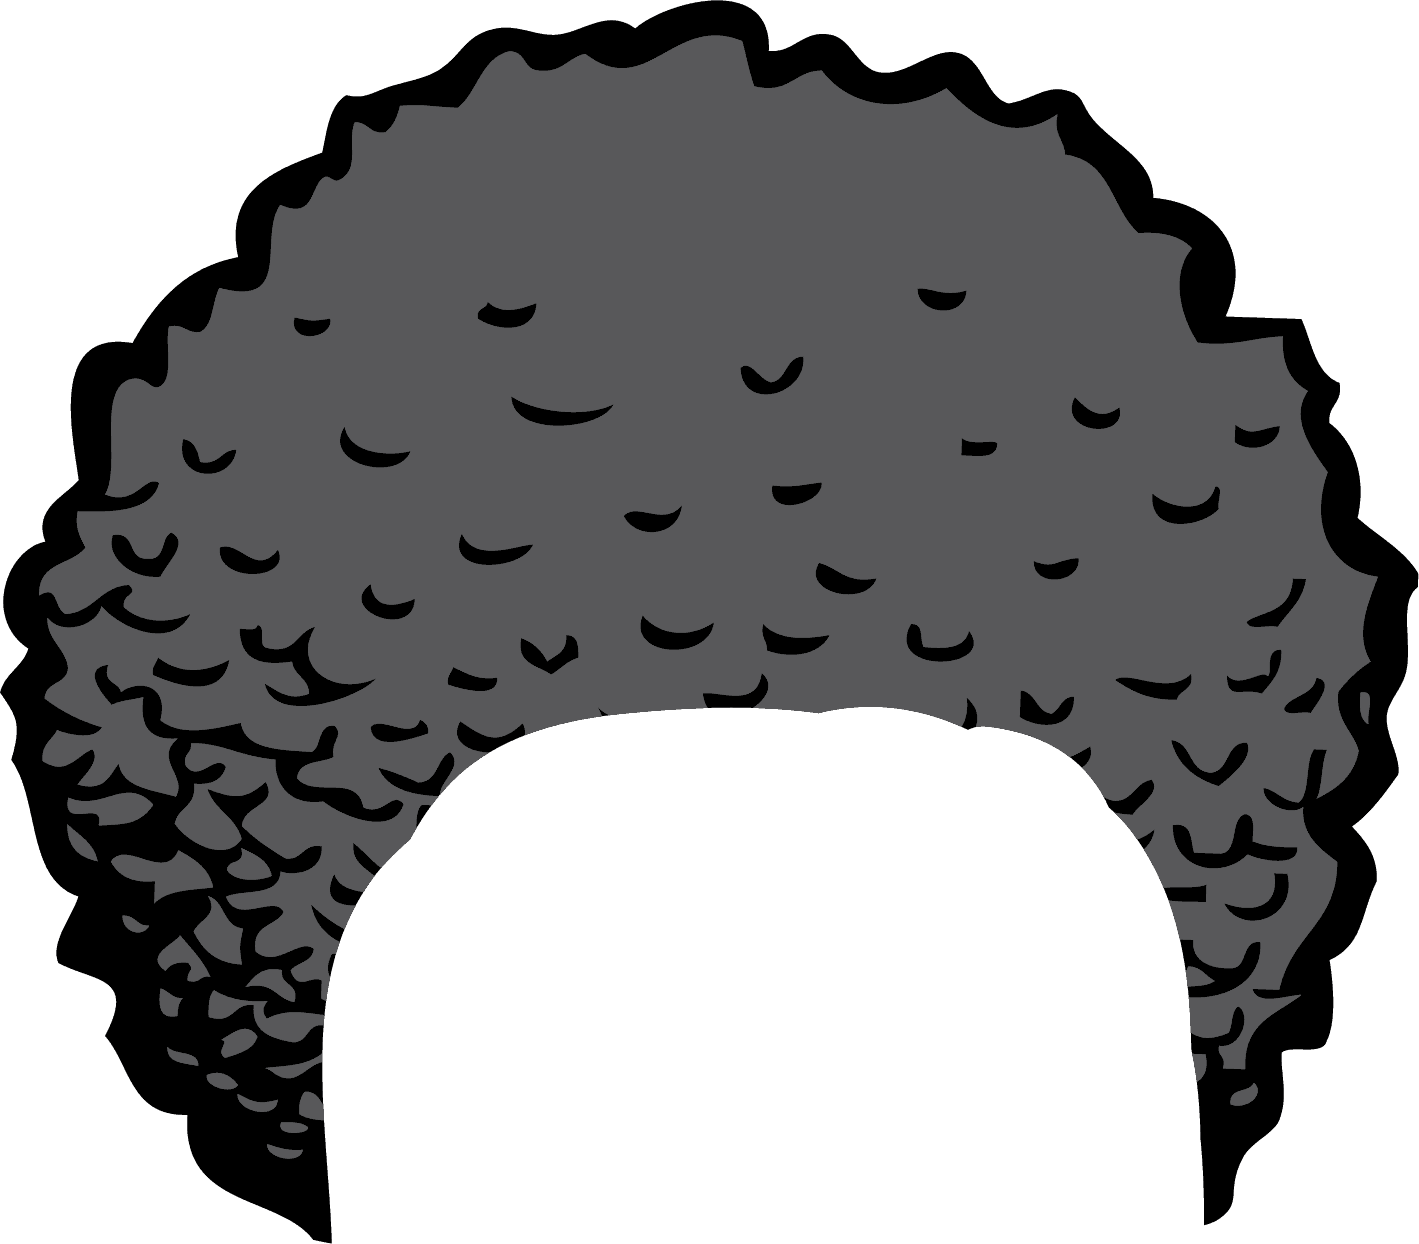 Hair Clip Art Images Clipart Panda Free Clipart Images Hair Clipart Clip Art Art Images